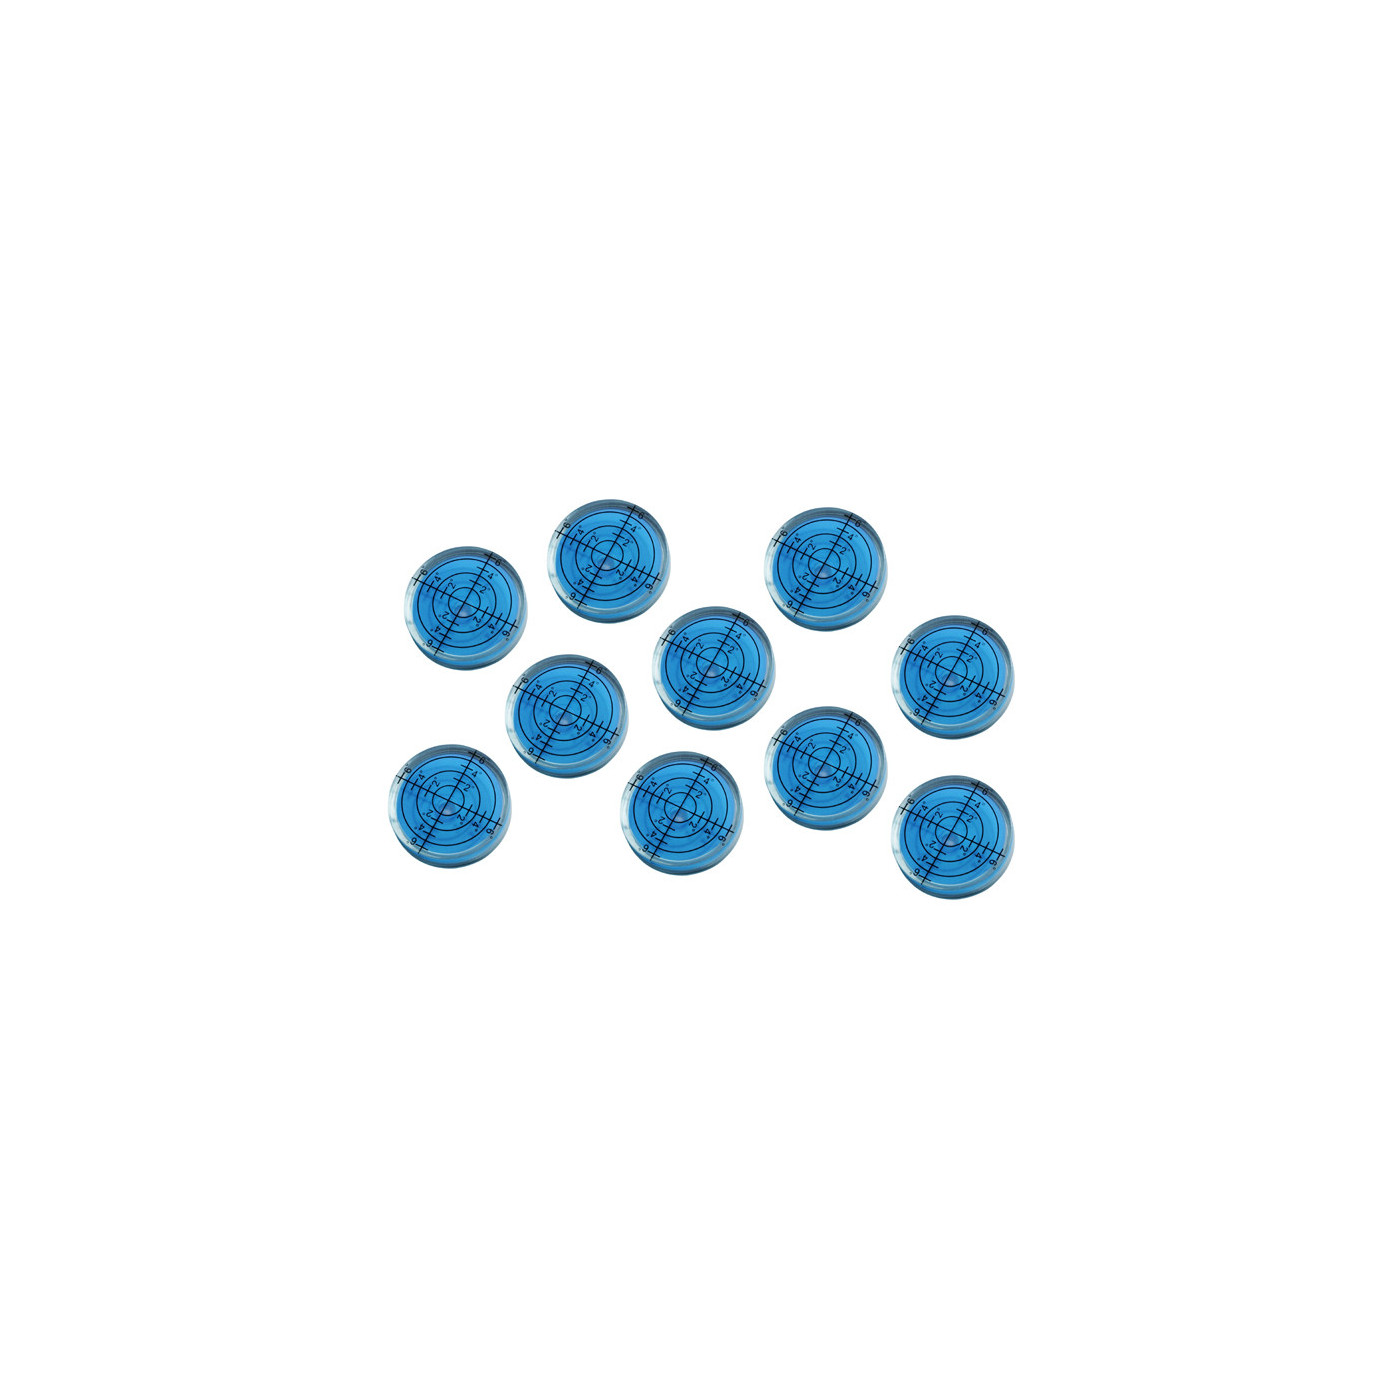 Conjunto de 10 viales de nivel de burbuja (32x7 mm, azul)  - 1